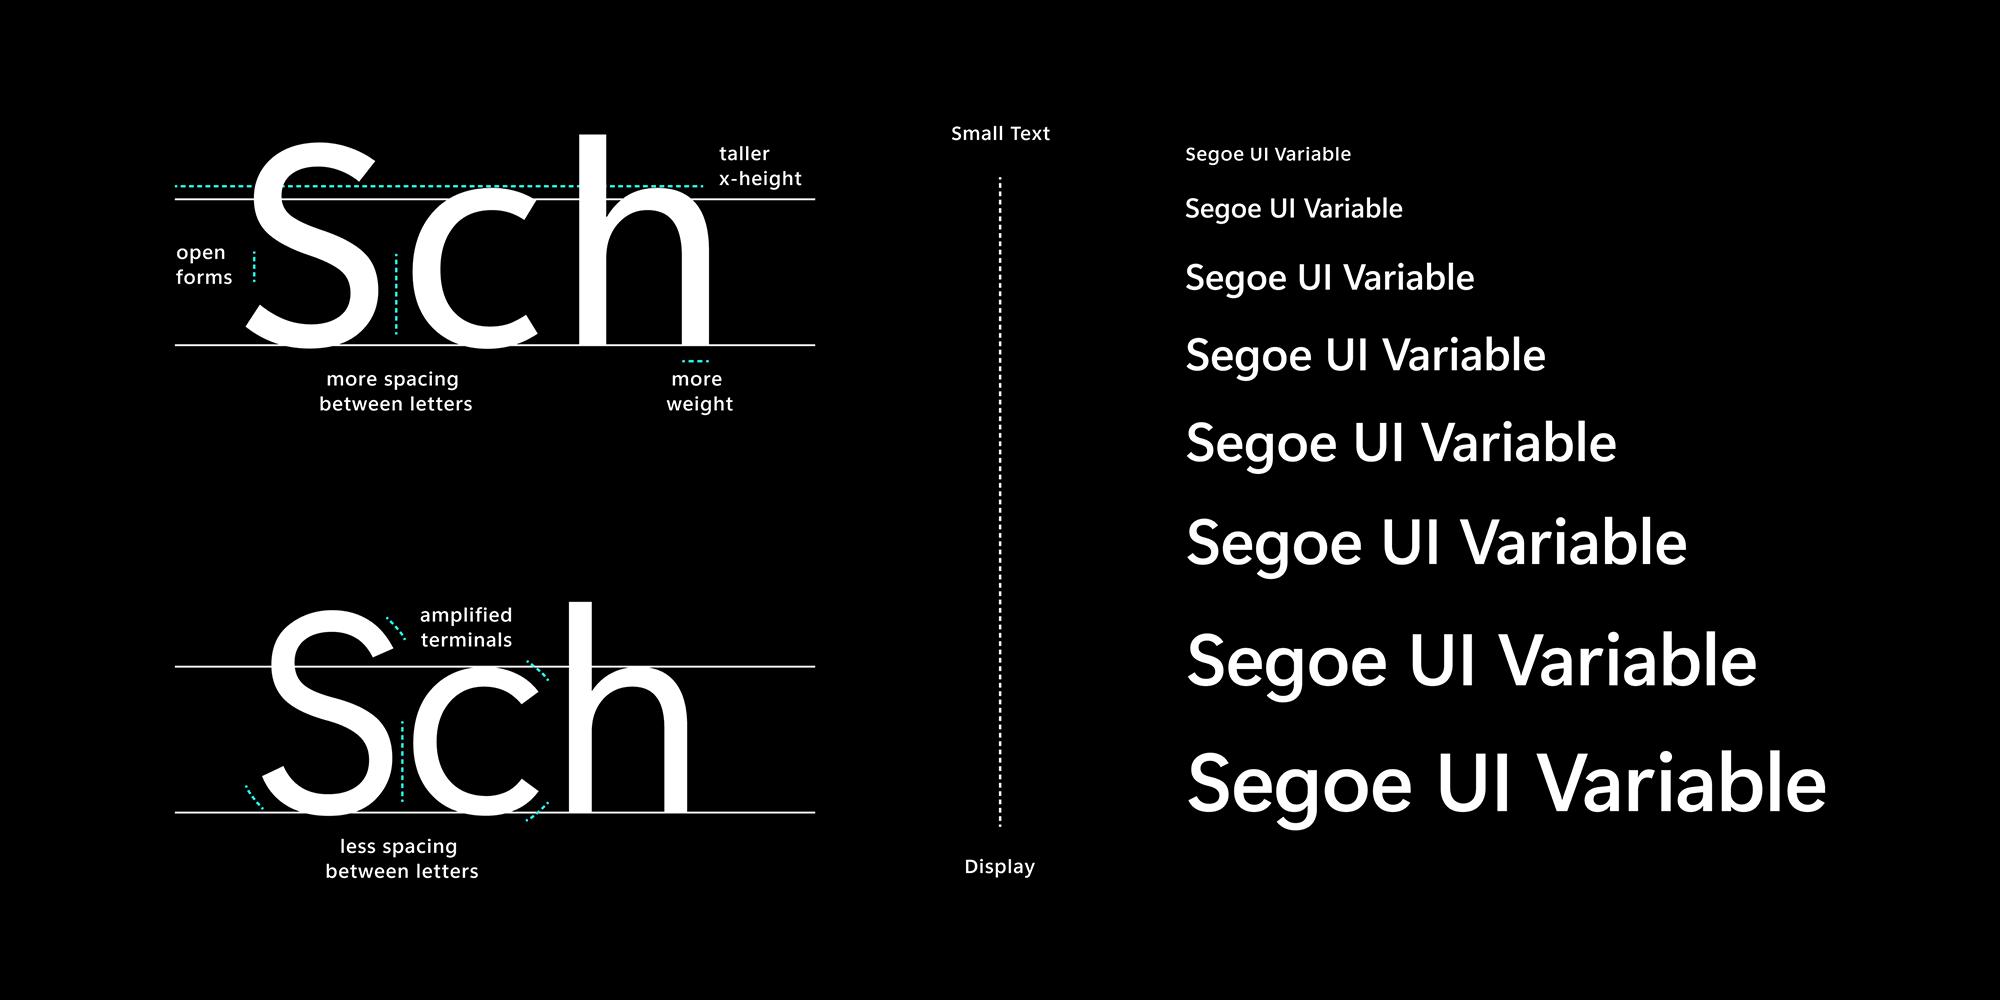 B21376 Segoe Variable